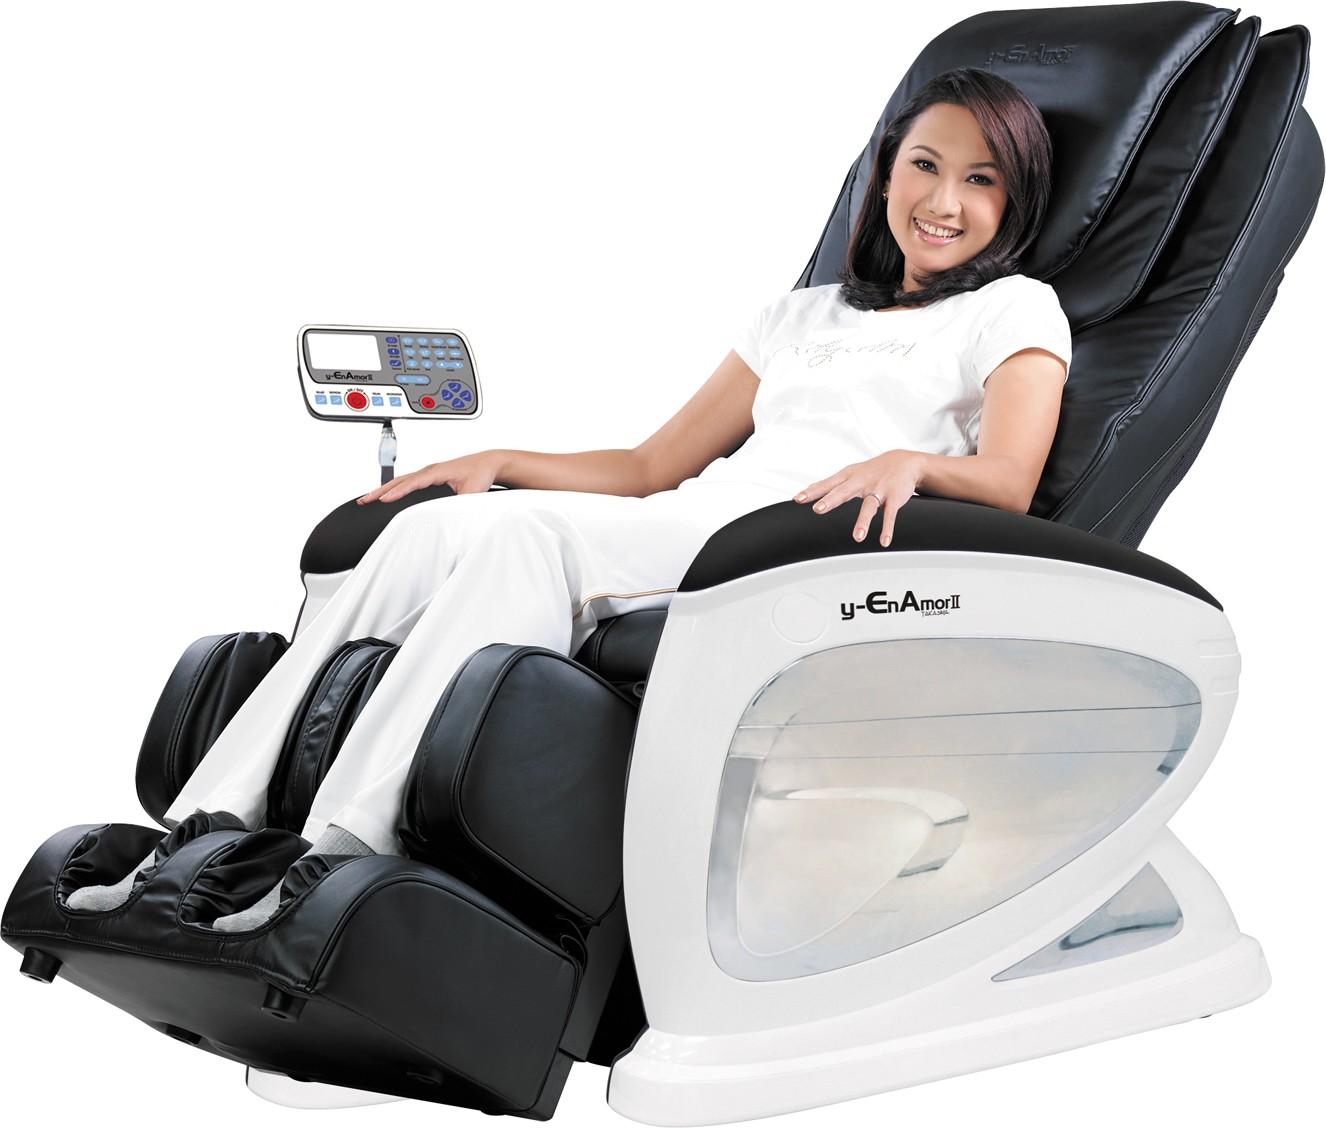 Massage chair 39 s blog massage chair 39 s news updates for Chair massage